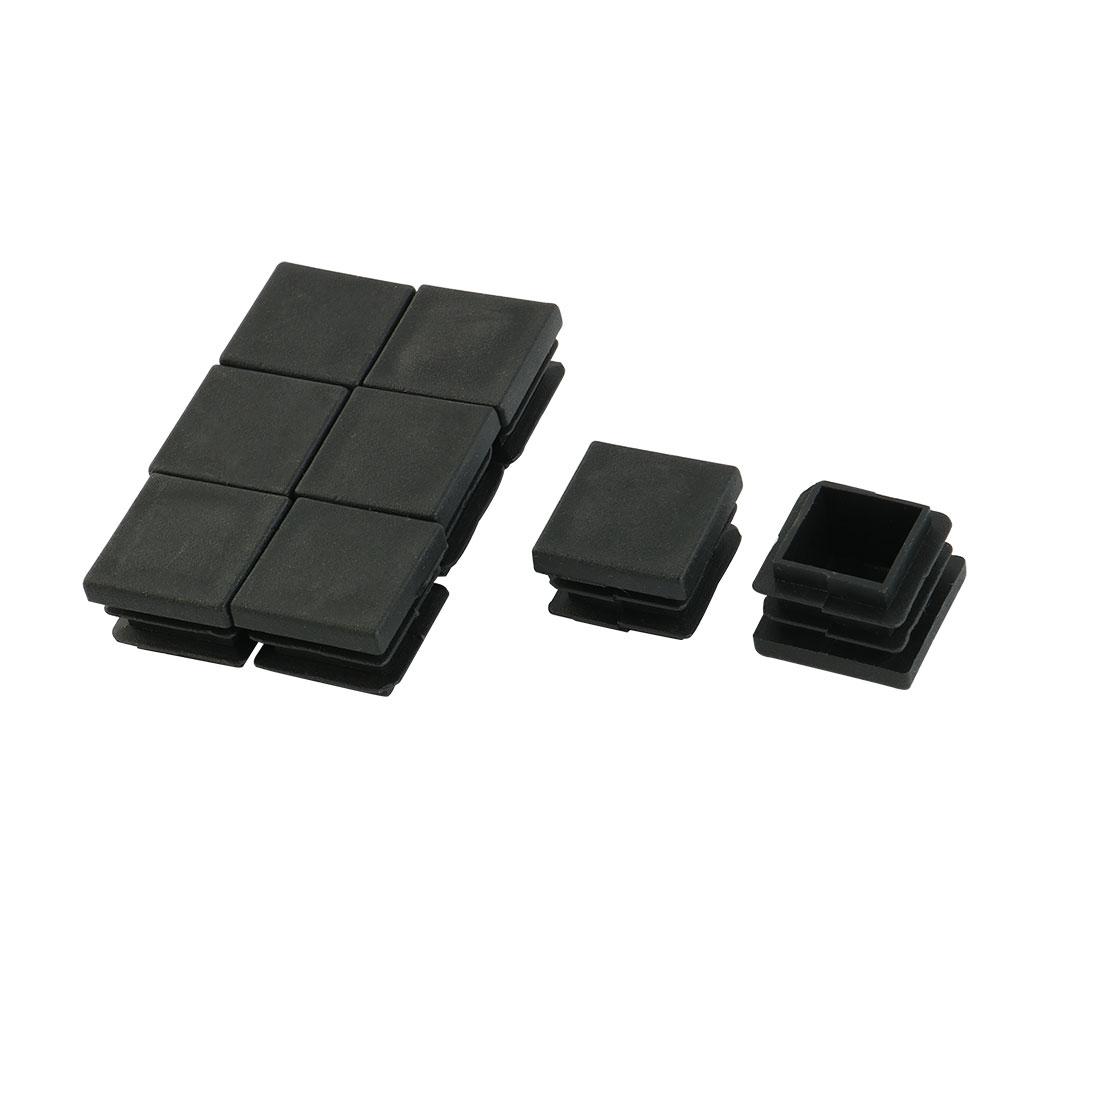 Plastic Square Shaped Tube Inserts Furniture Glides End Blanking Caps 8pcs